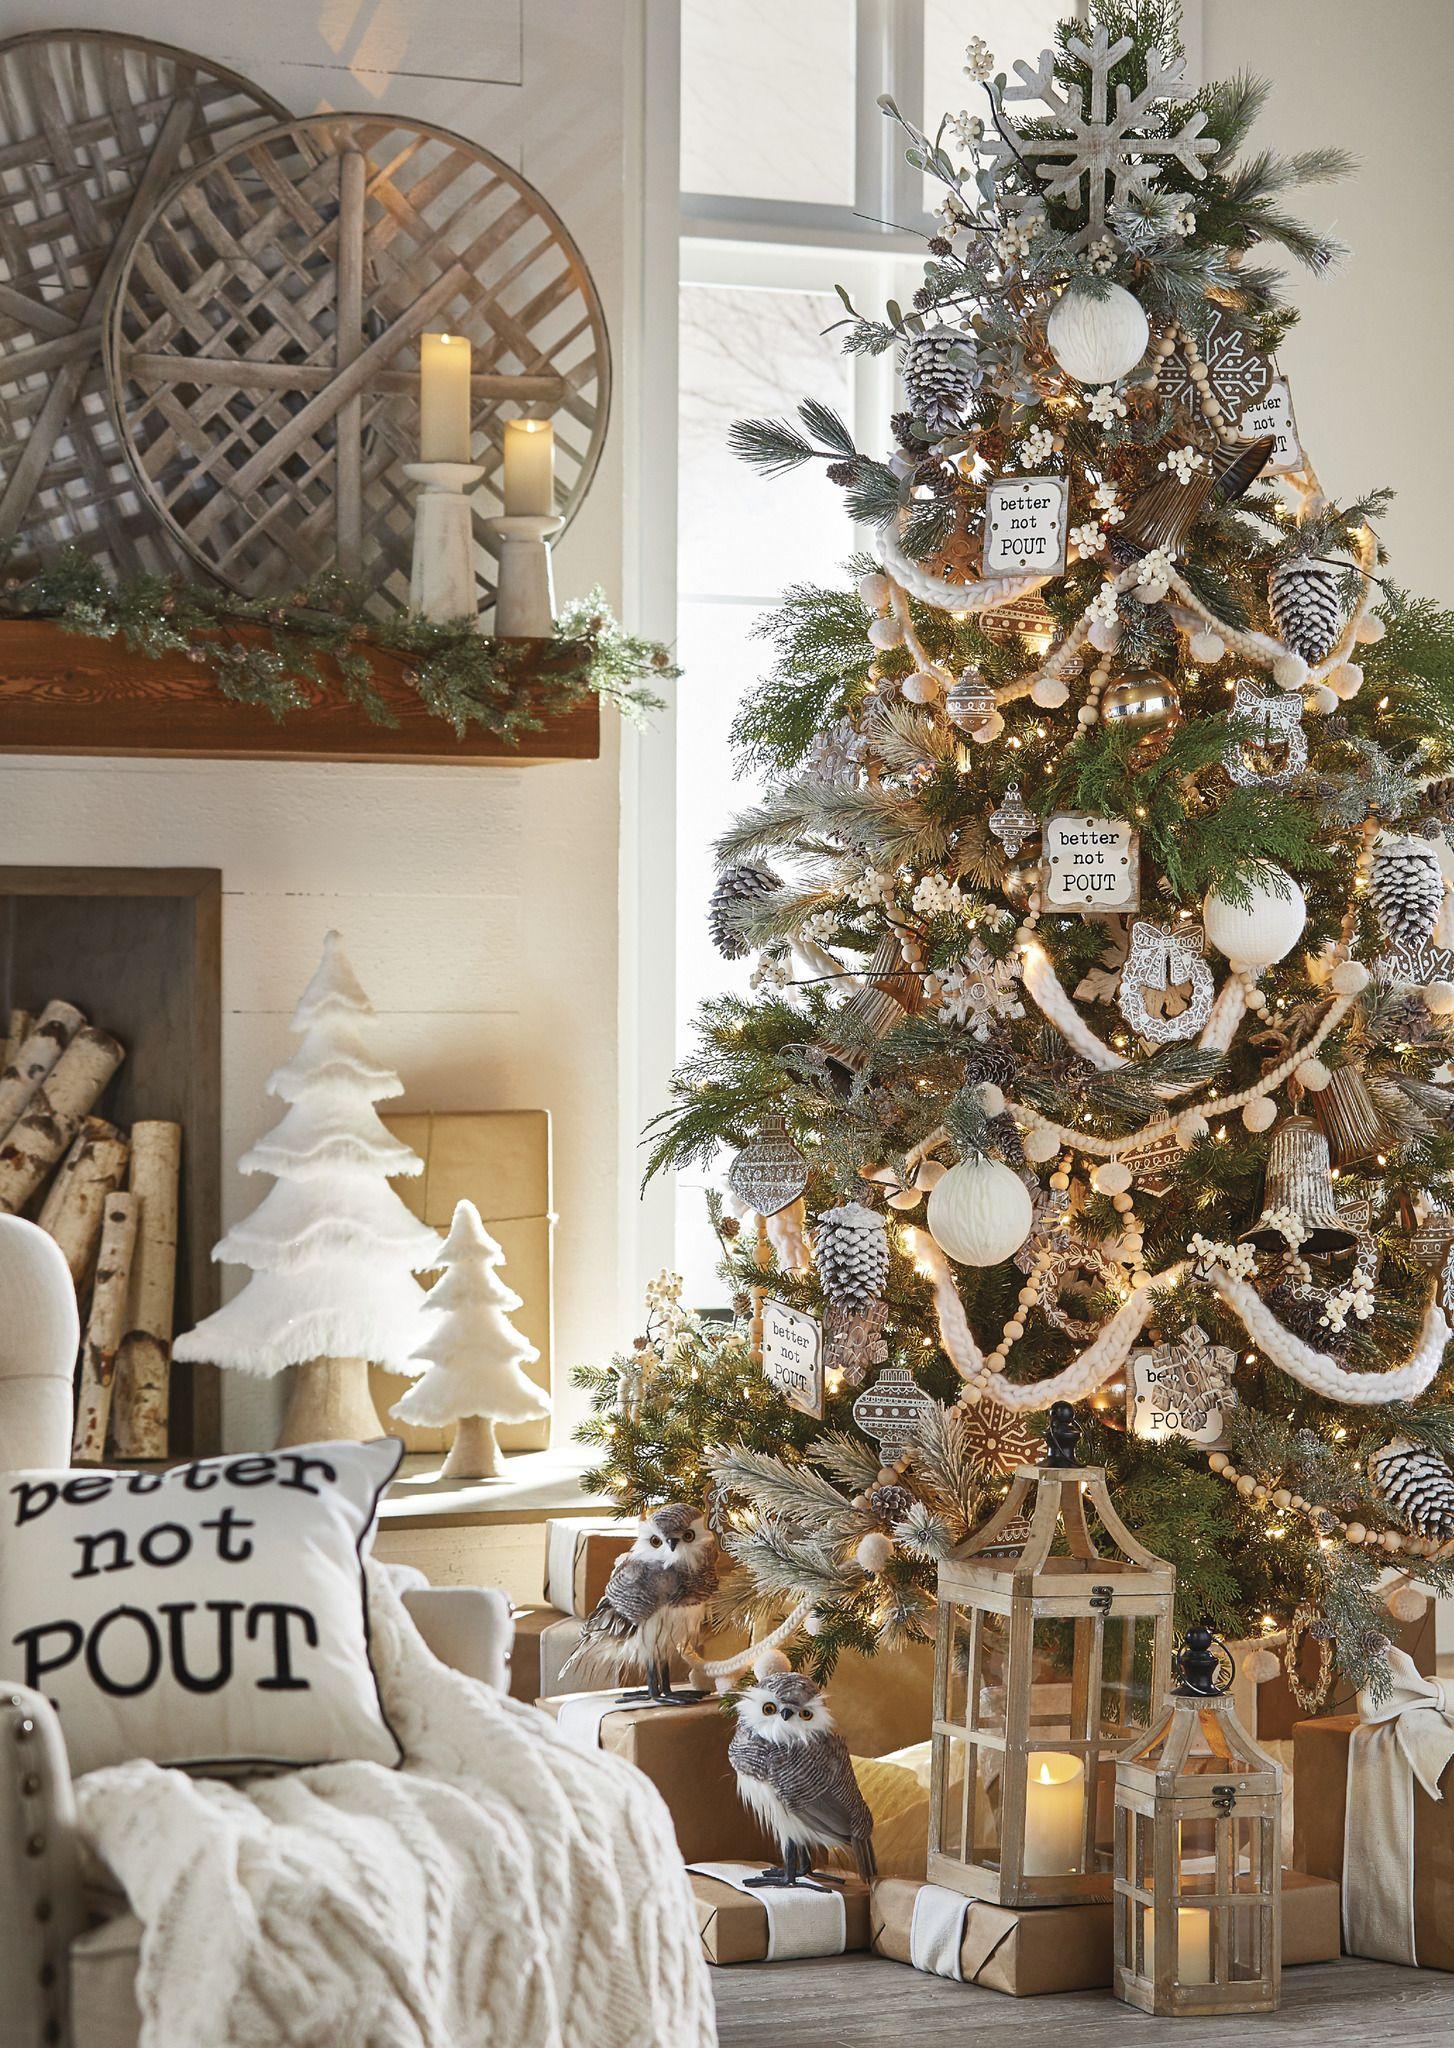 2019 RAZ Christmas Tree Inspiration - Trendy Tree Blog| Holiday Decor Inspiration | Wreath Tutorials|Holiday Decorations| Mesh & Ribbons